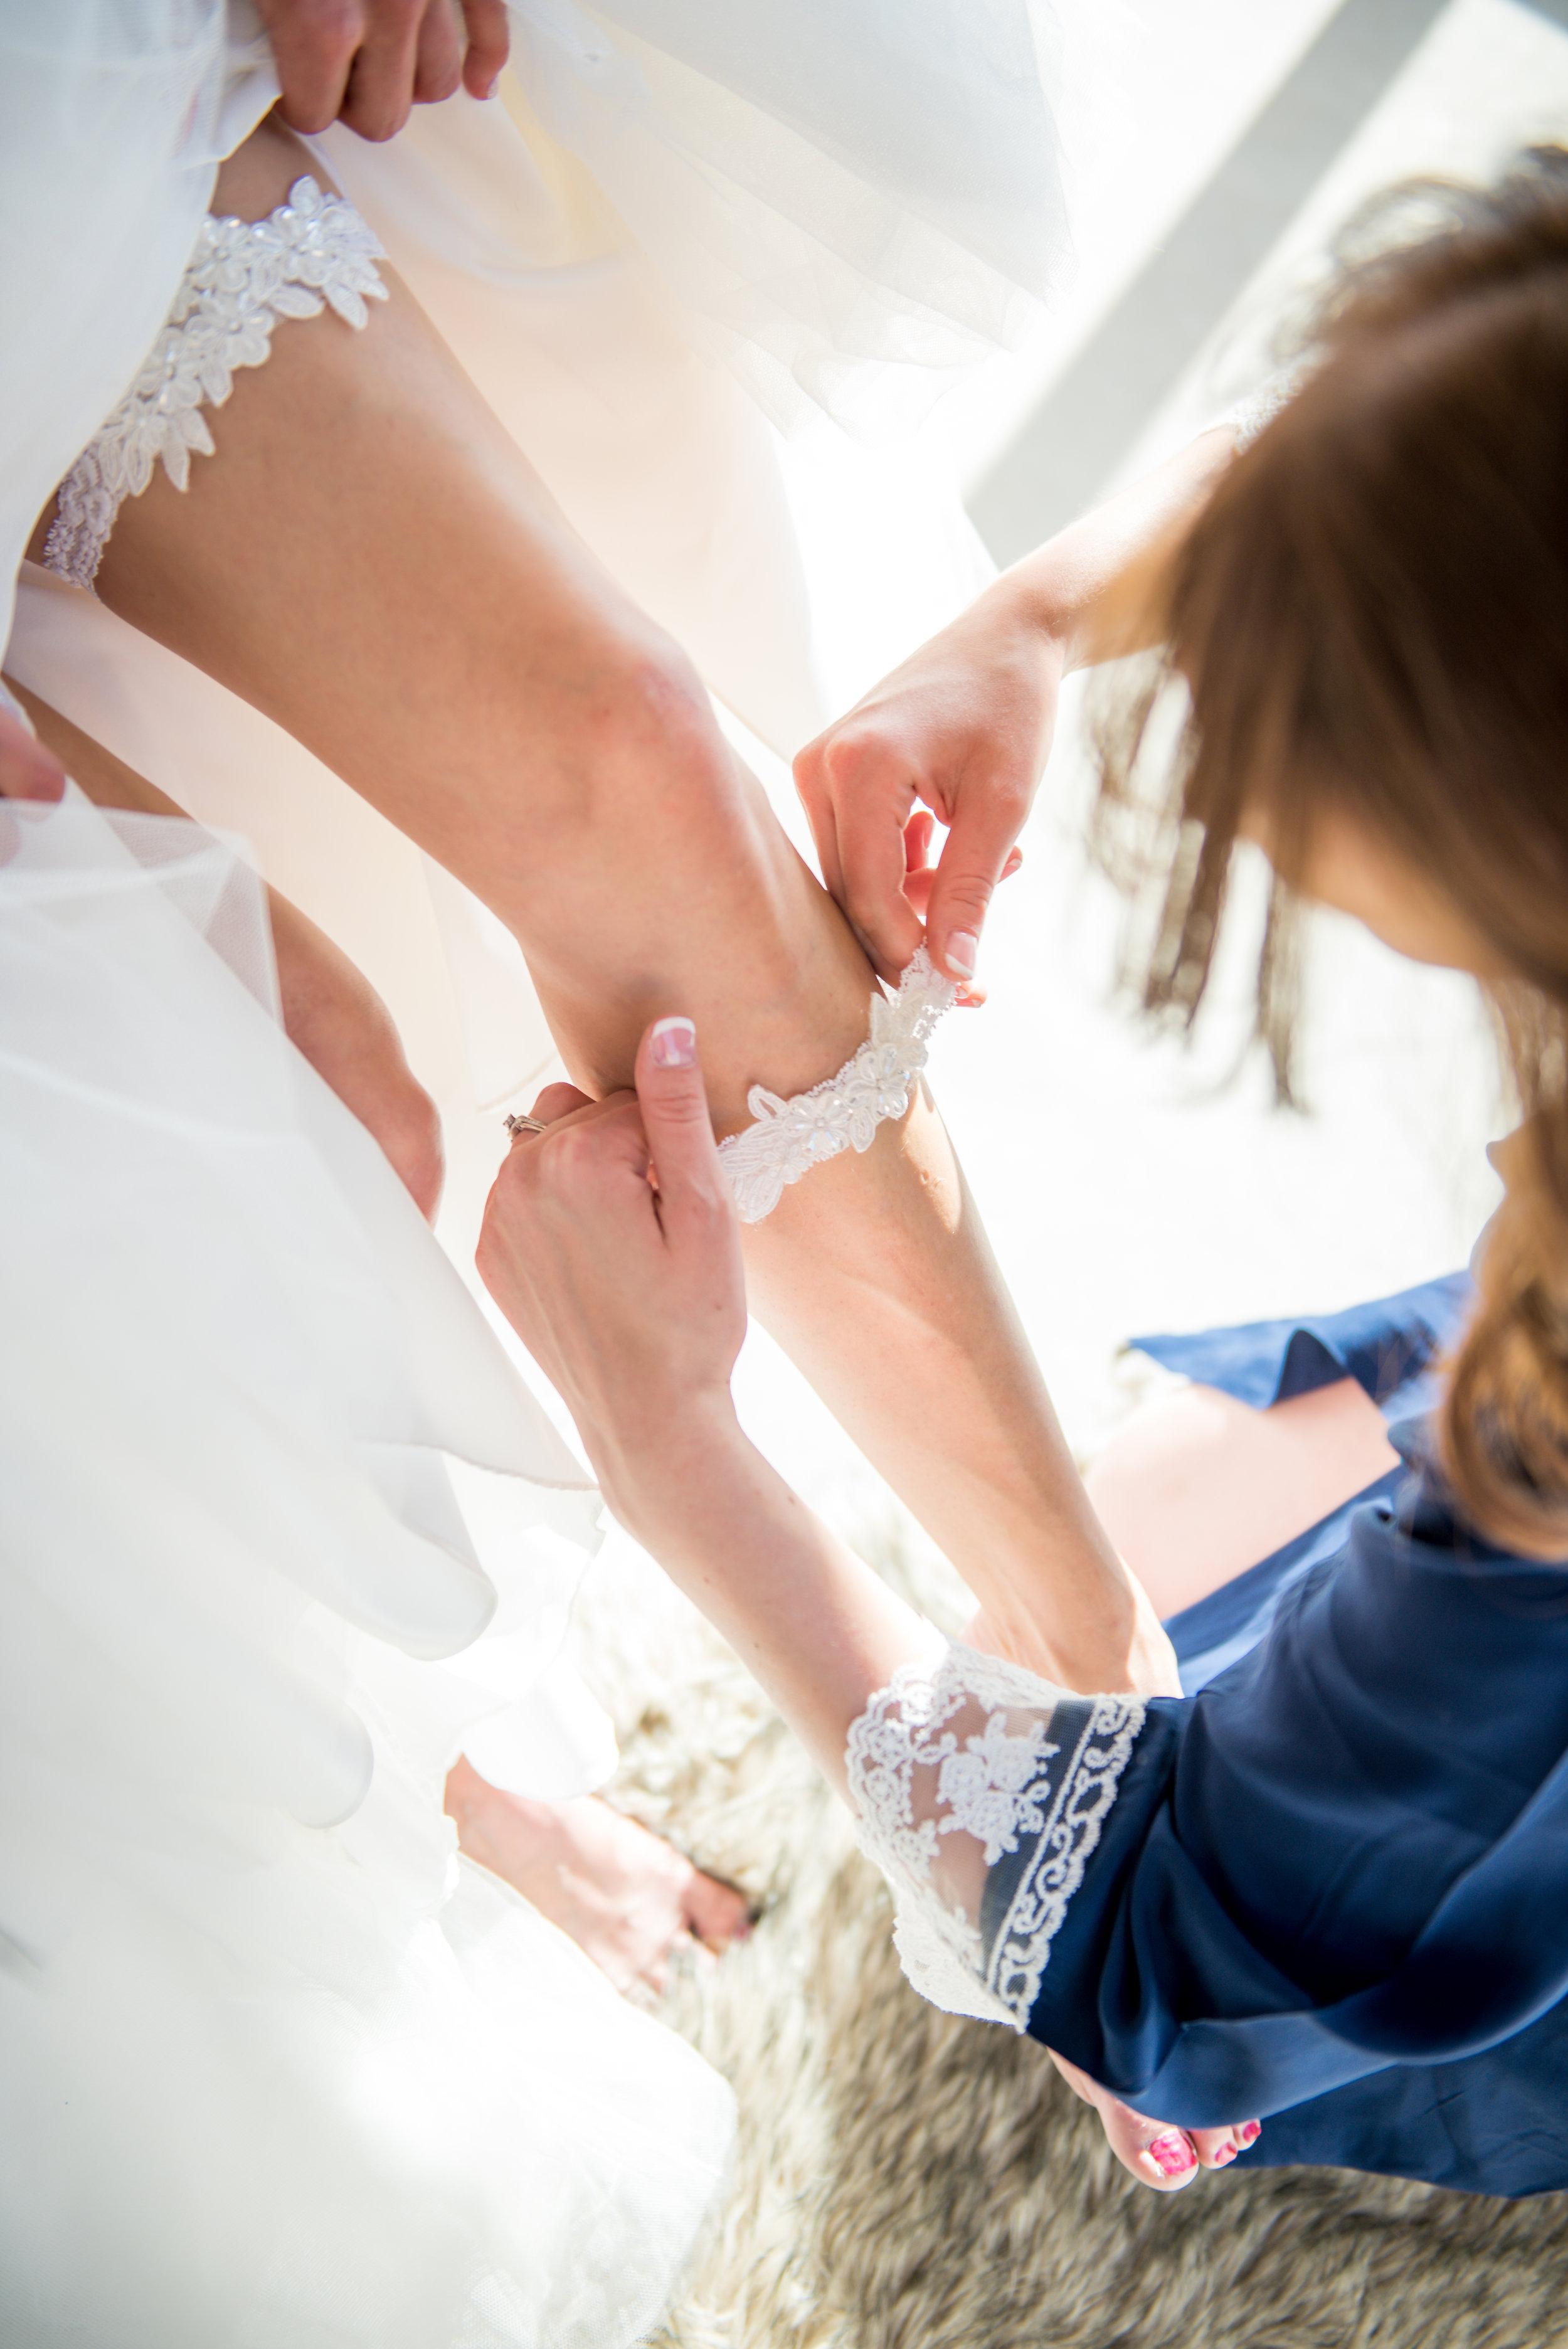 Dom-Wedding-May-19-2018-Photographer-Nickeys-Photo-Creations-3.jpg